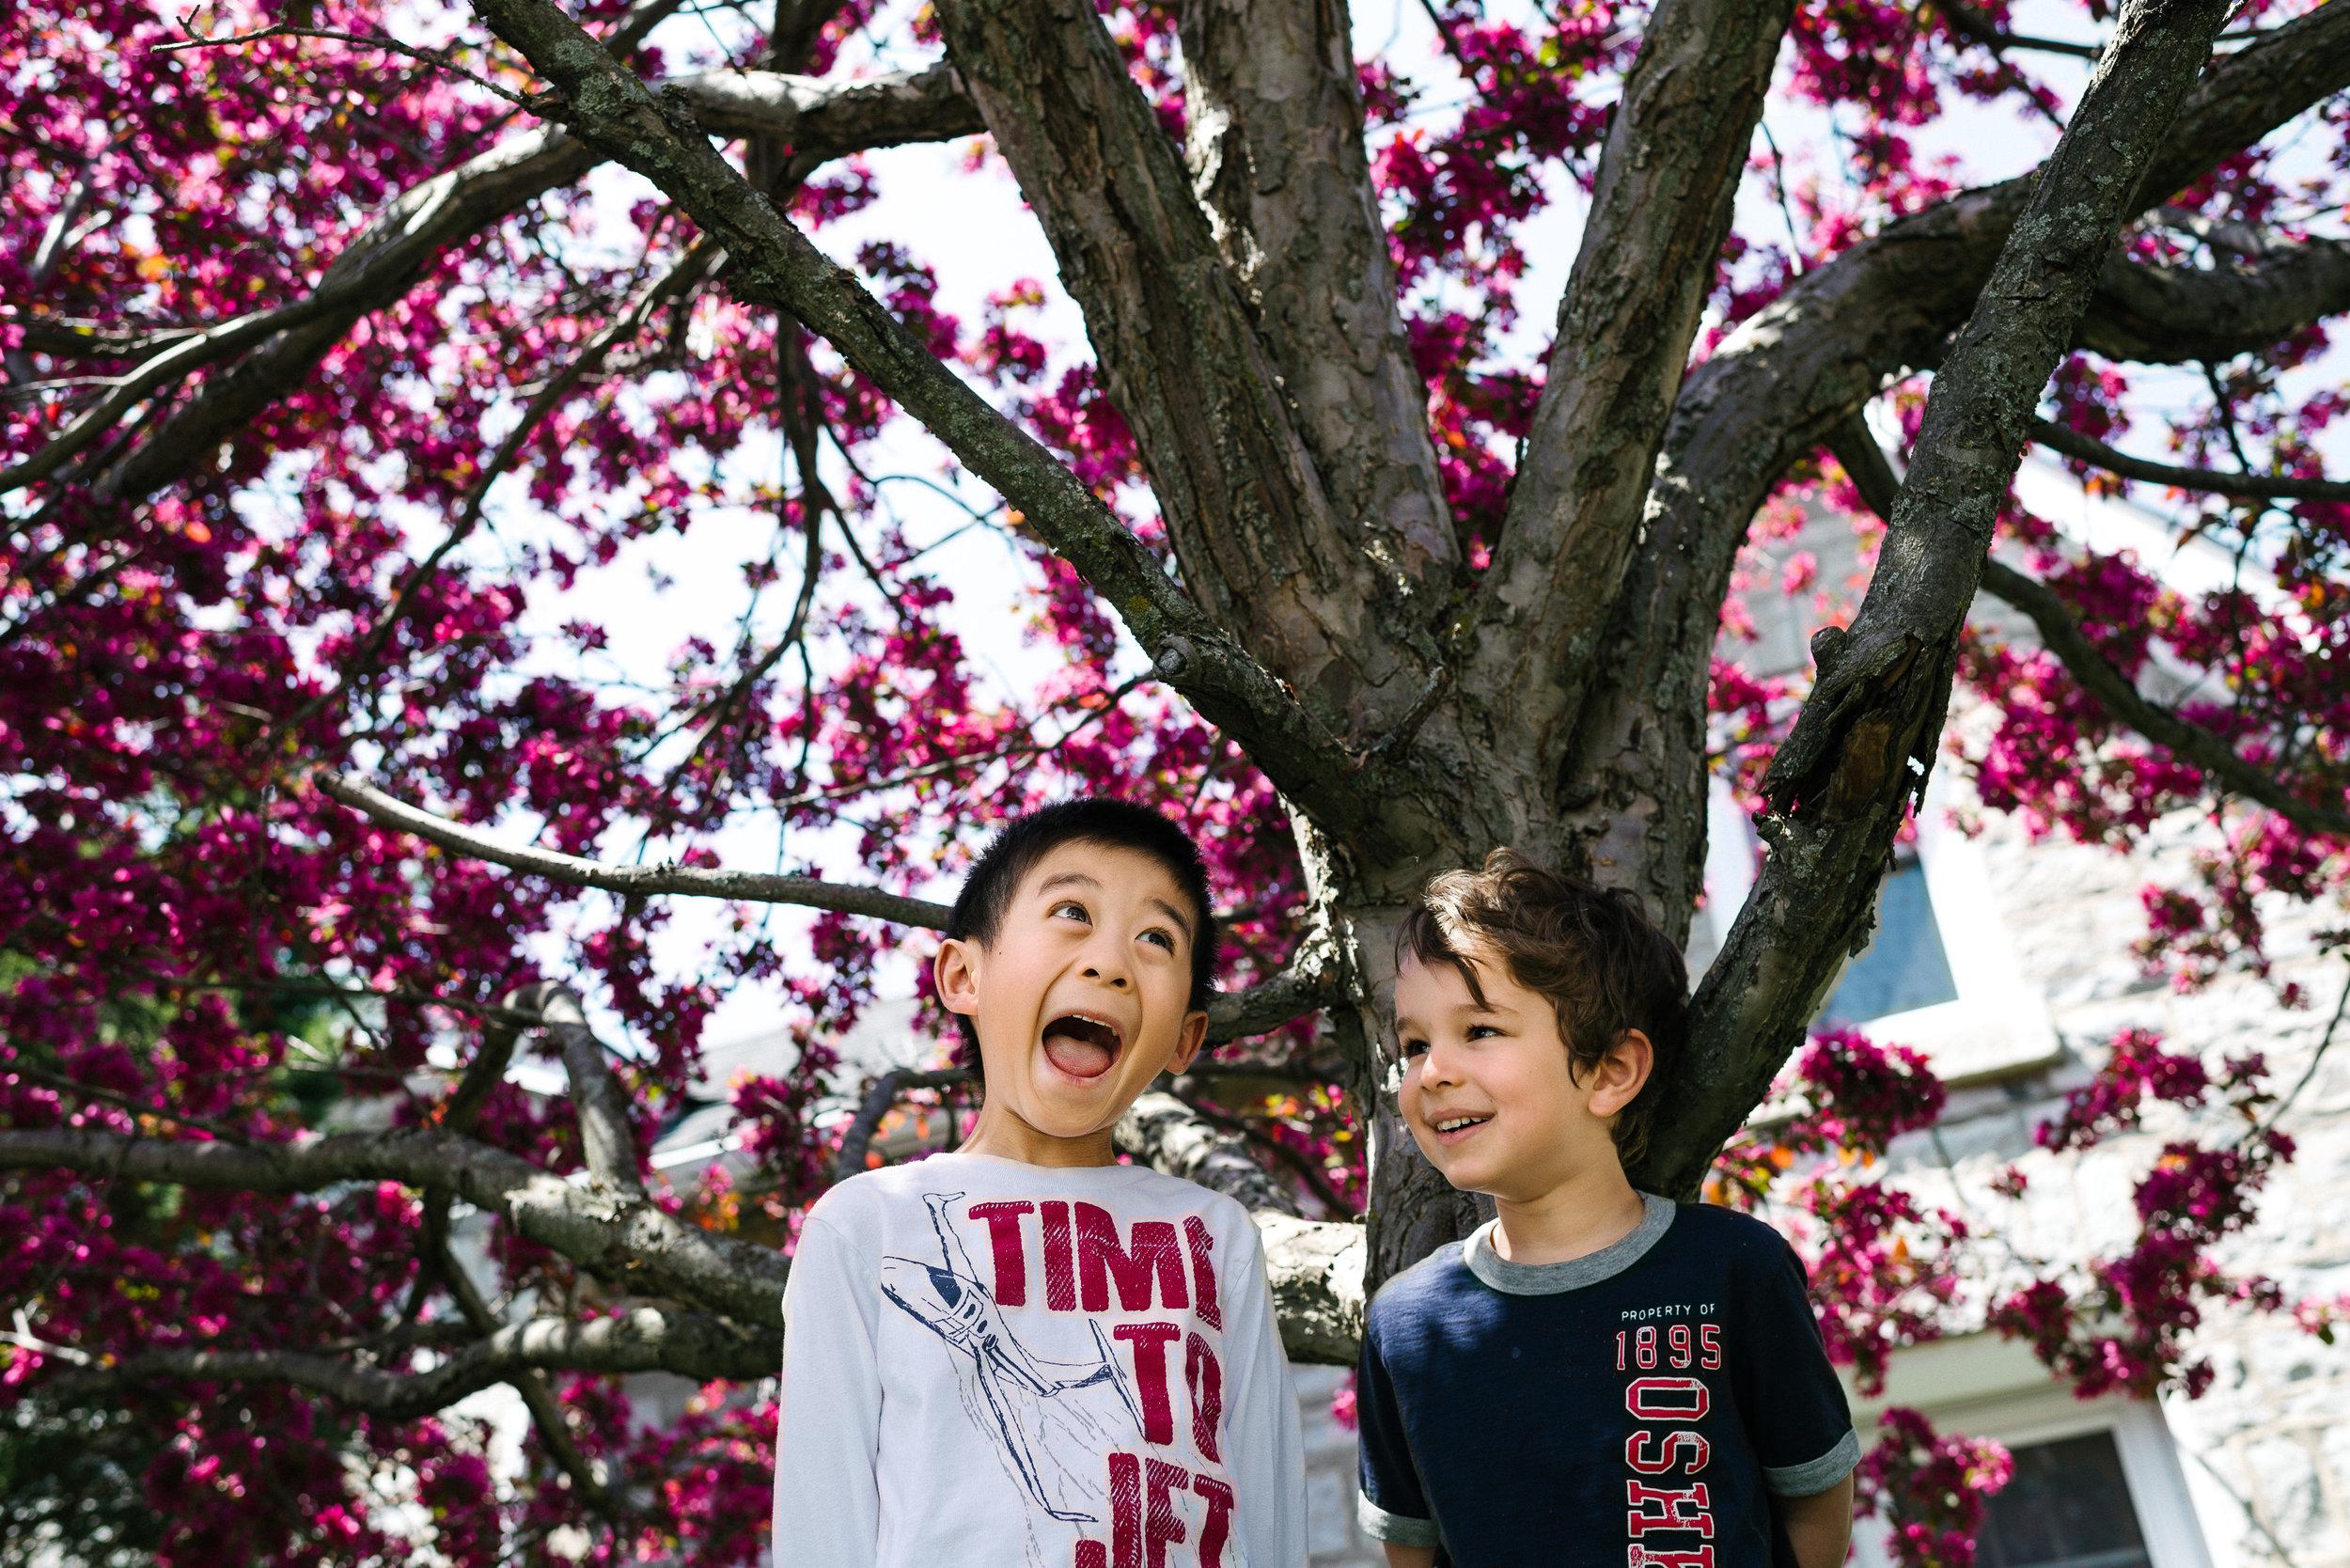 documentary school photography viara mileva kingston toronto ottawa-115721vm.jpg